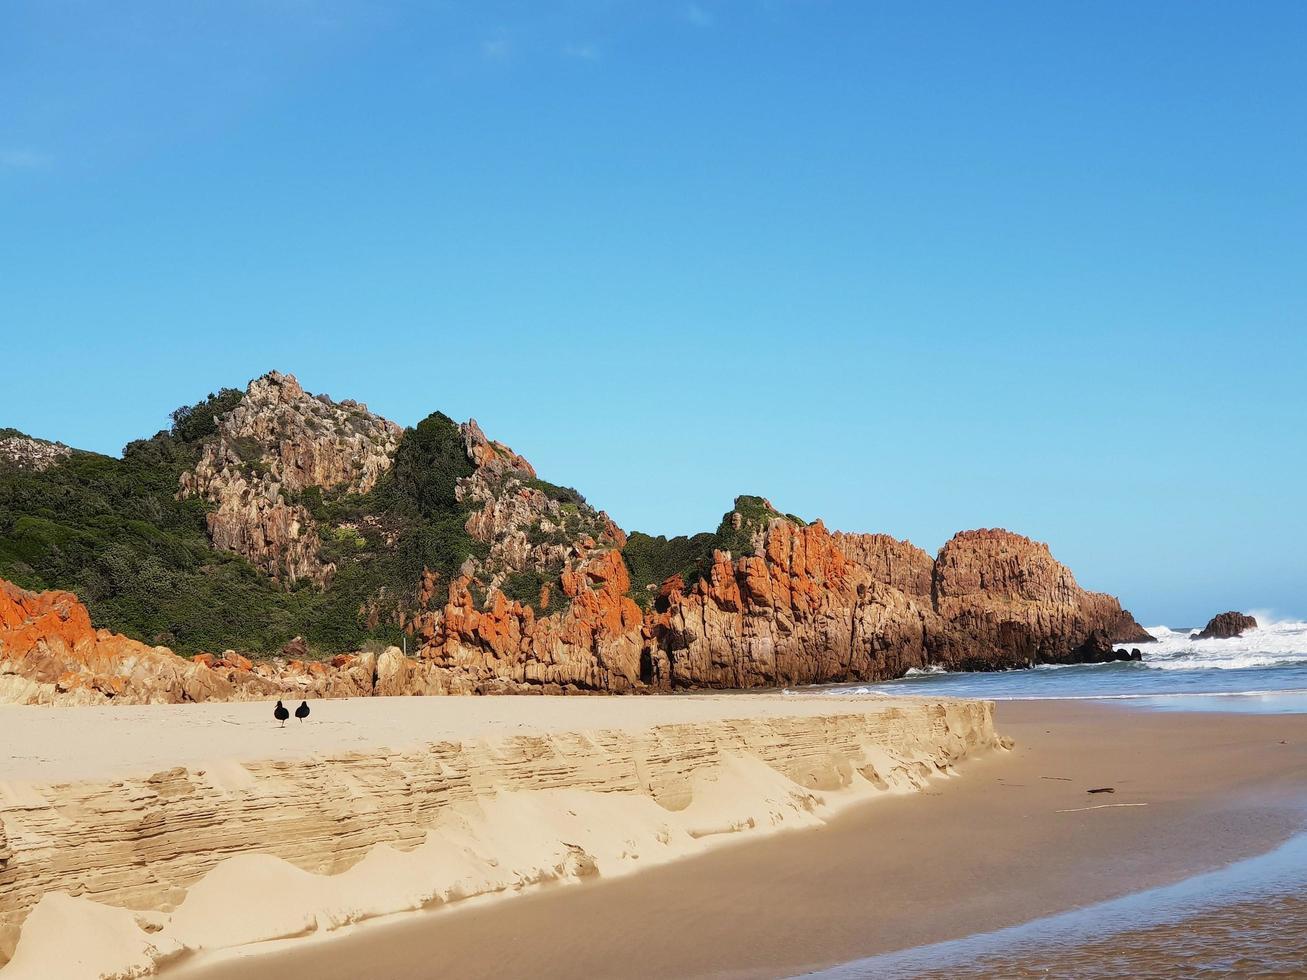 bergformation på stranden foto